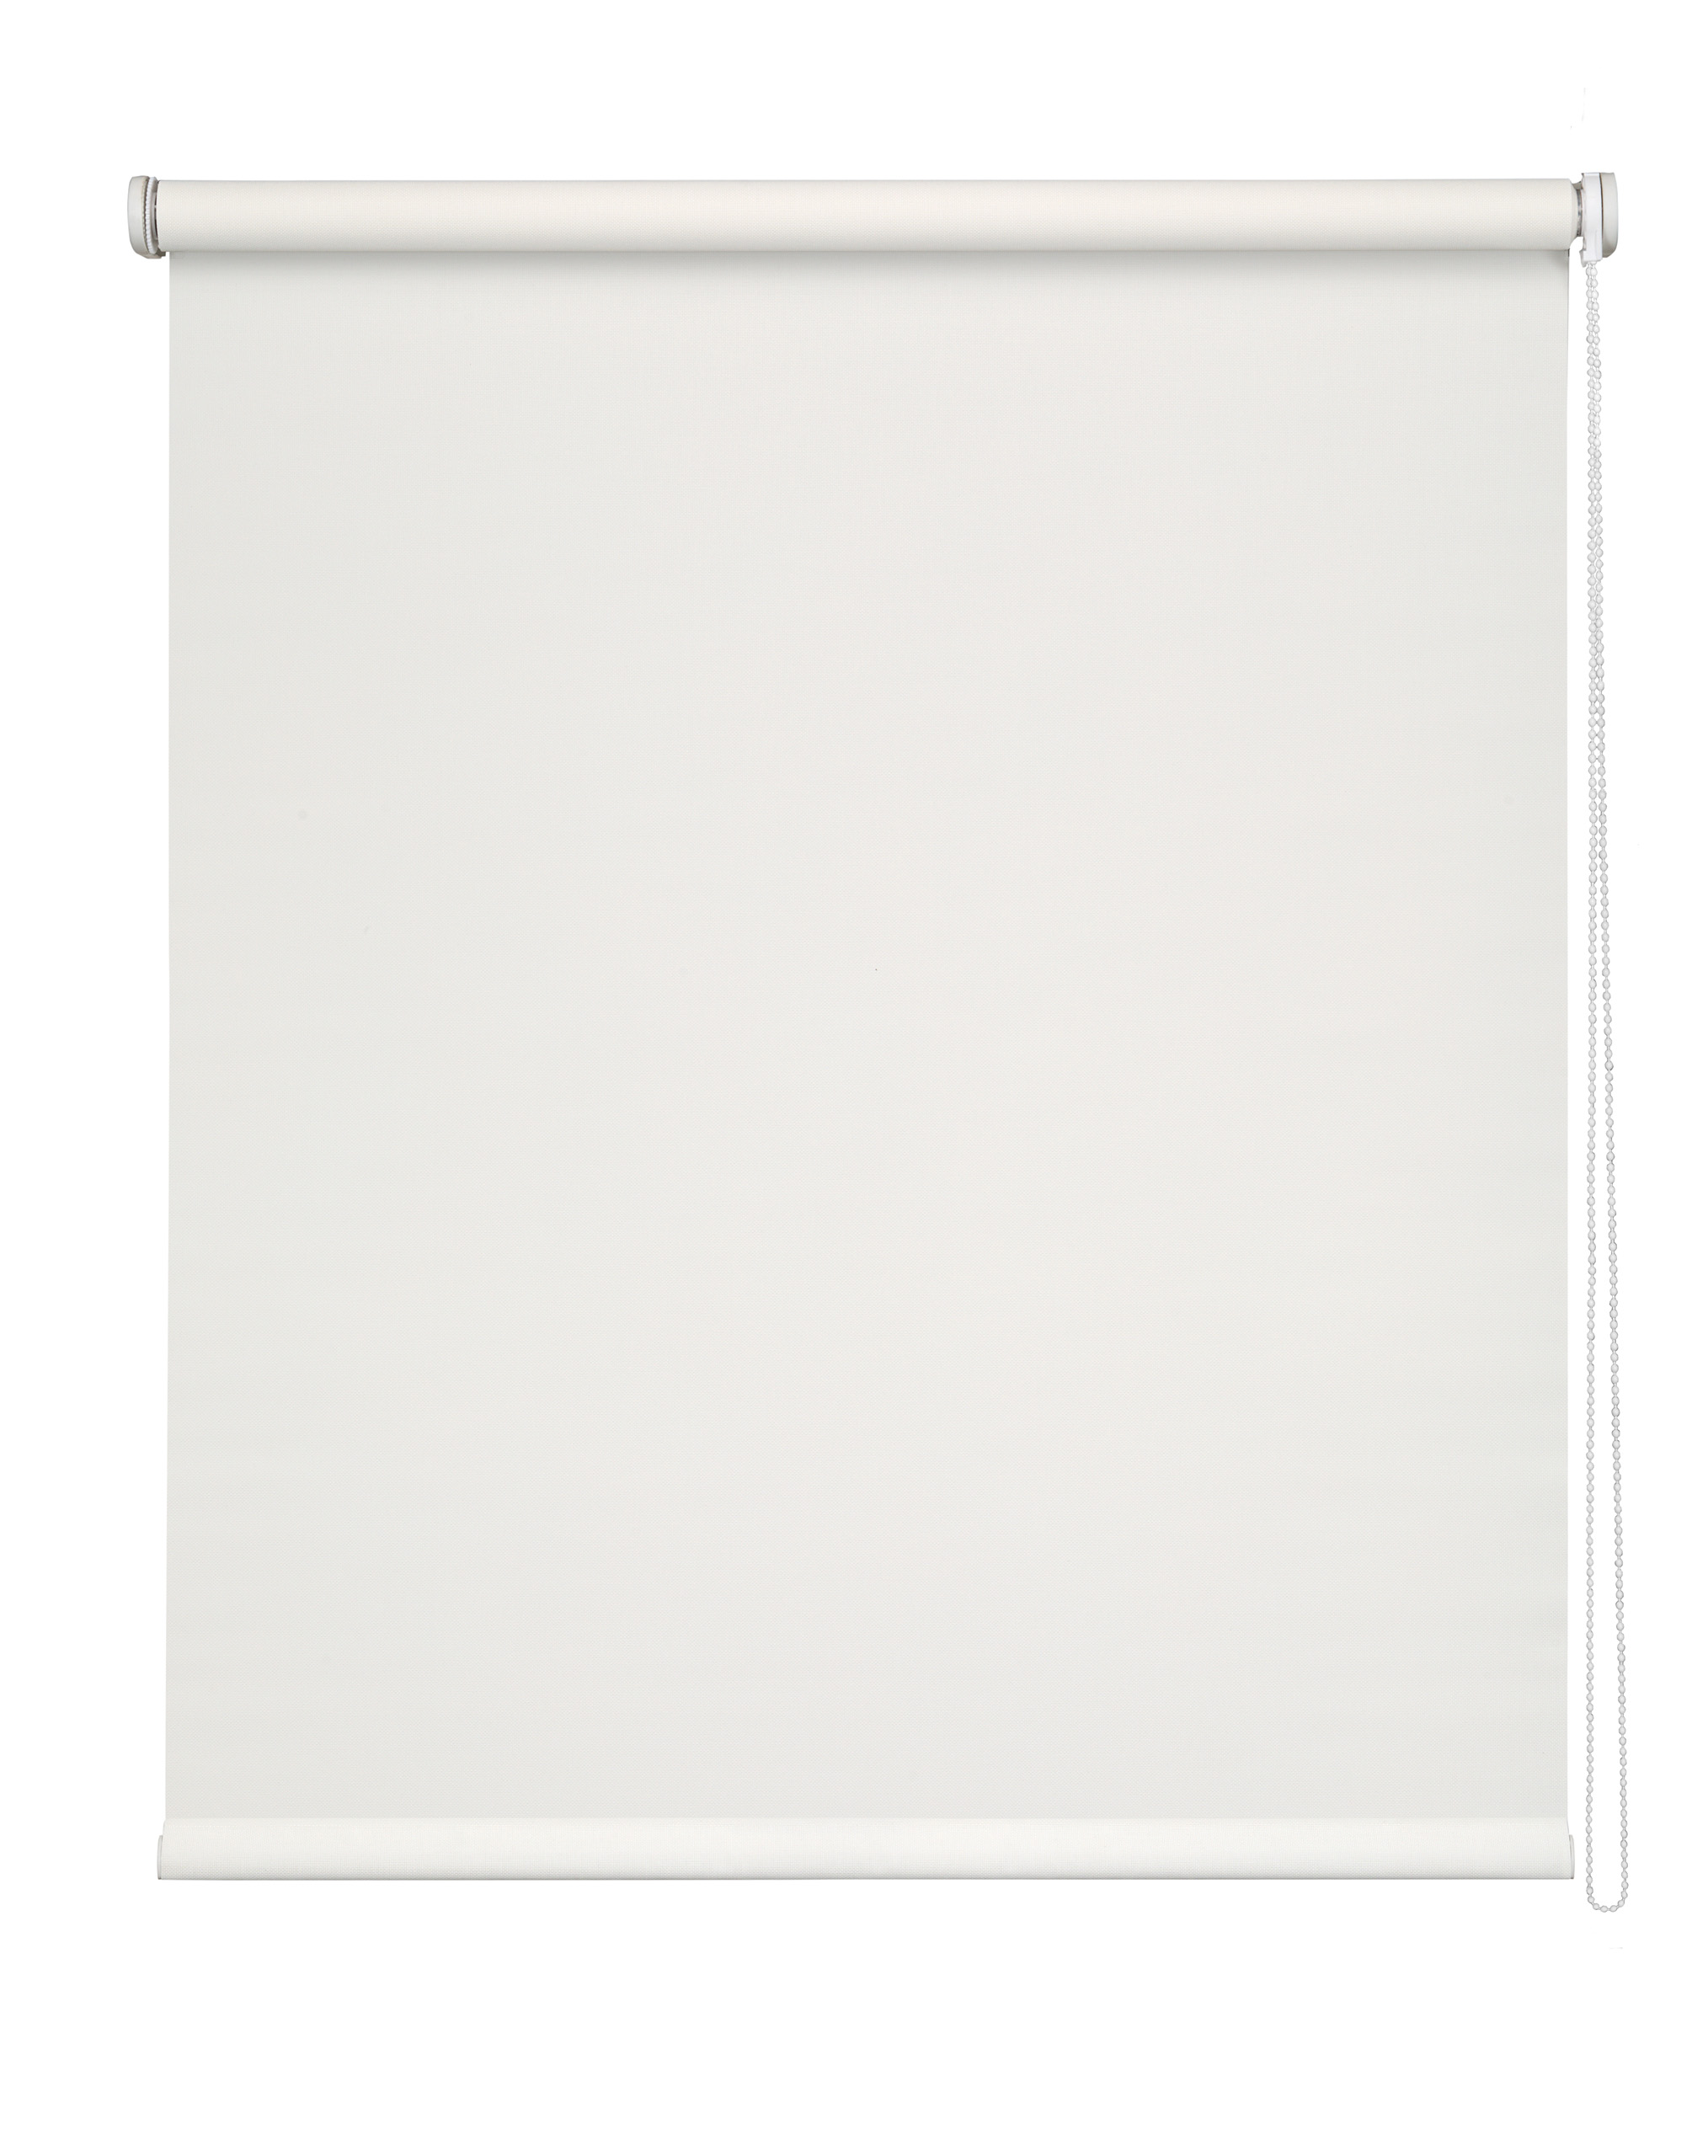 Store Enrouleur voile Screen - Blanc - 150 x 250 cm